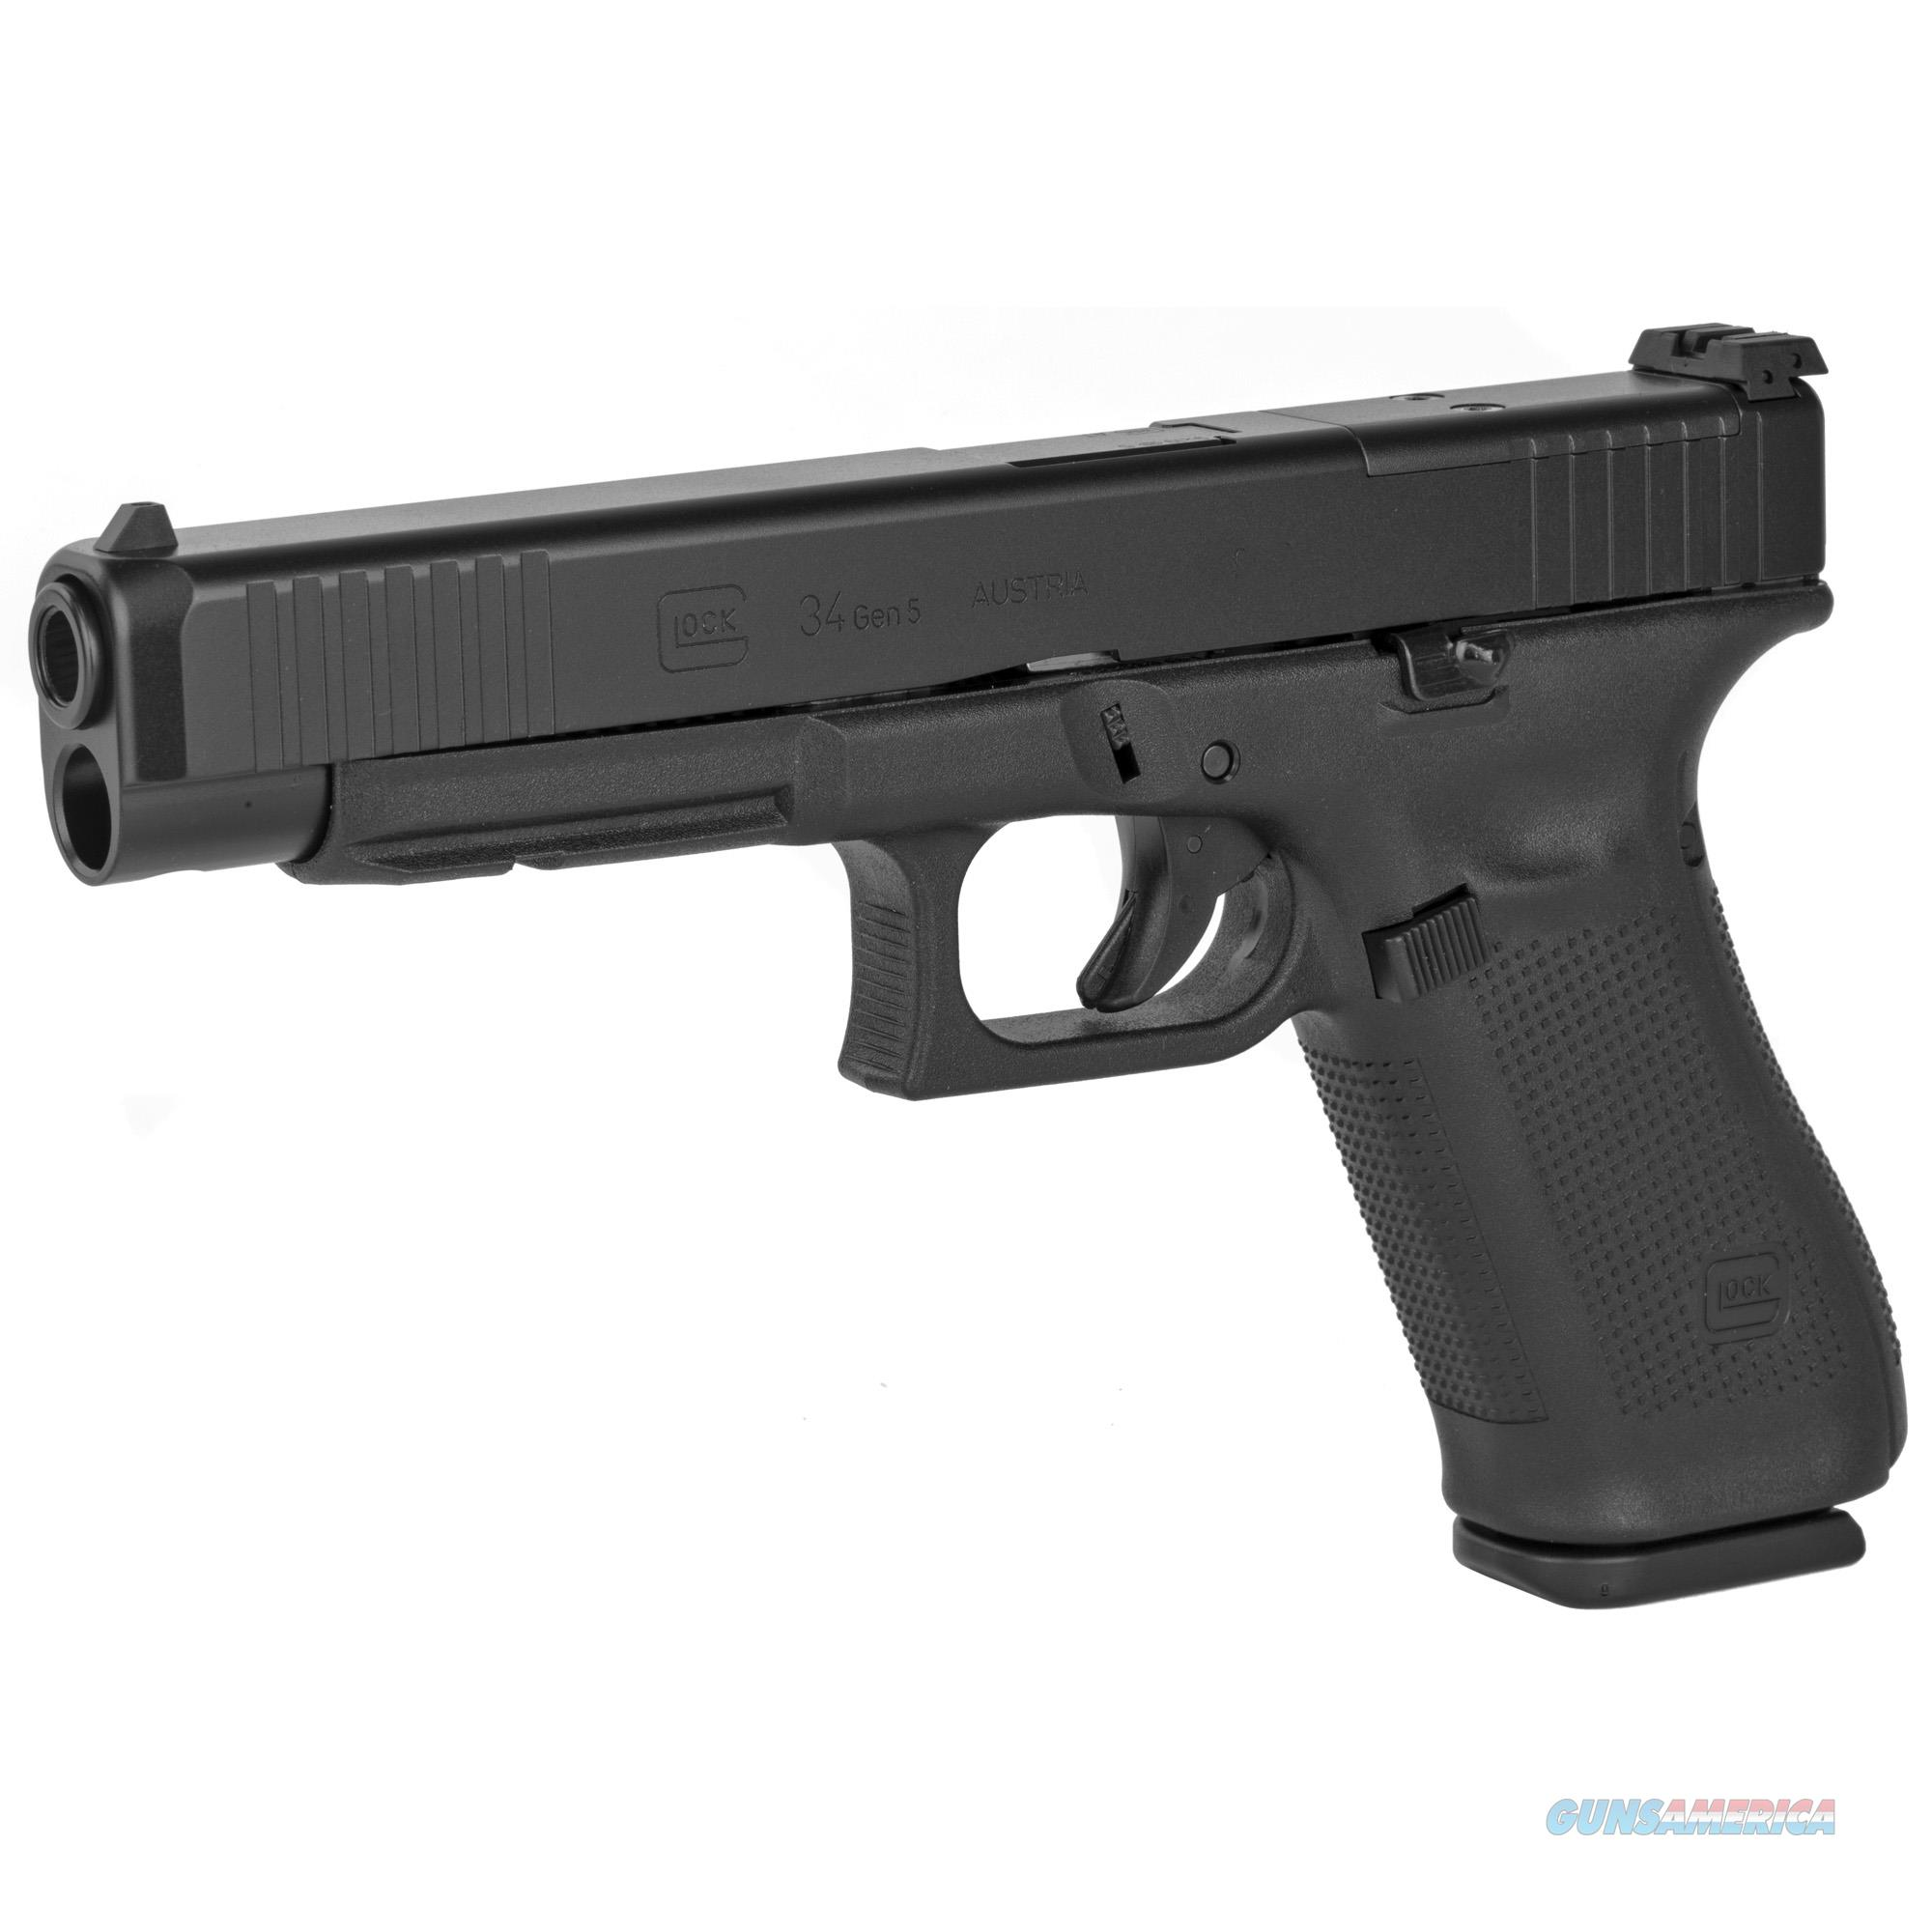 Glock 34 Gen5 9mm MOS Ready w/3 Mags!  Guns > Pistols > Glock Pistols > 34